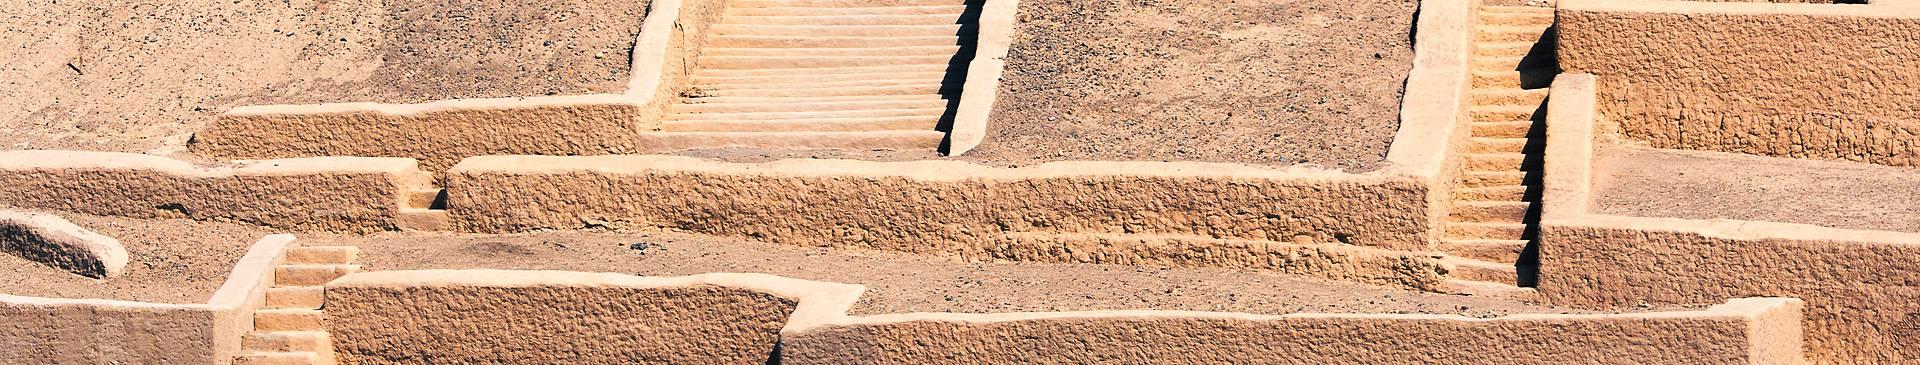 Peru historical sites